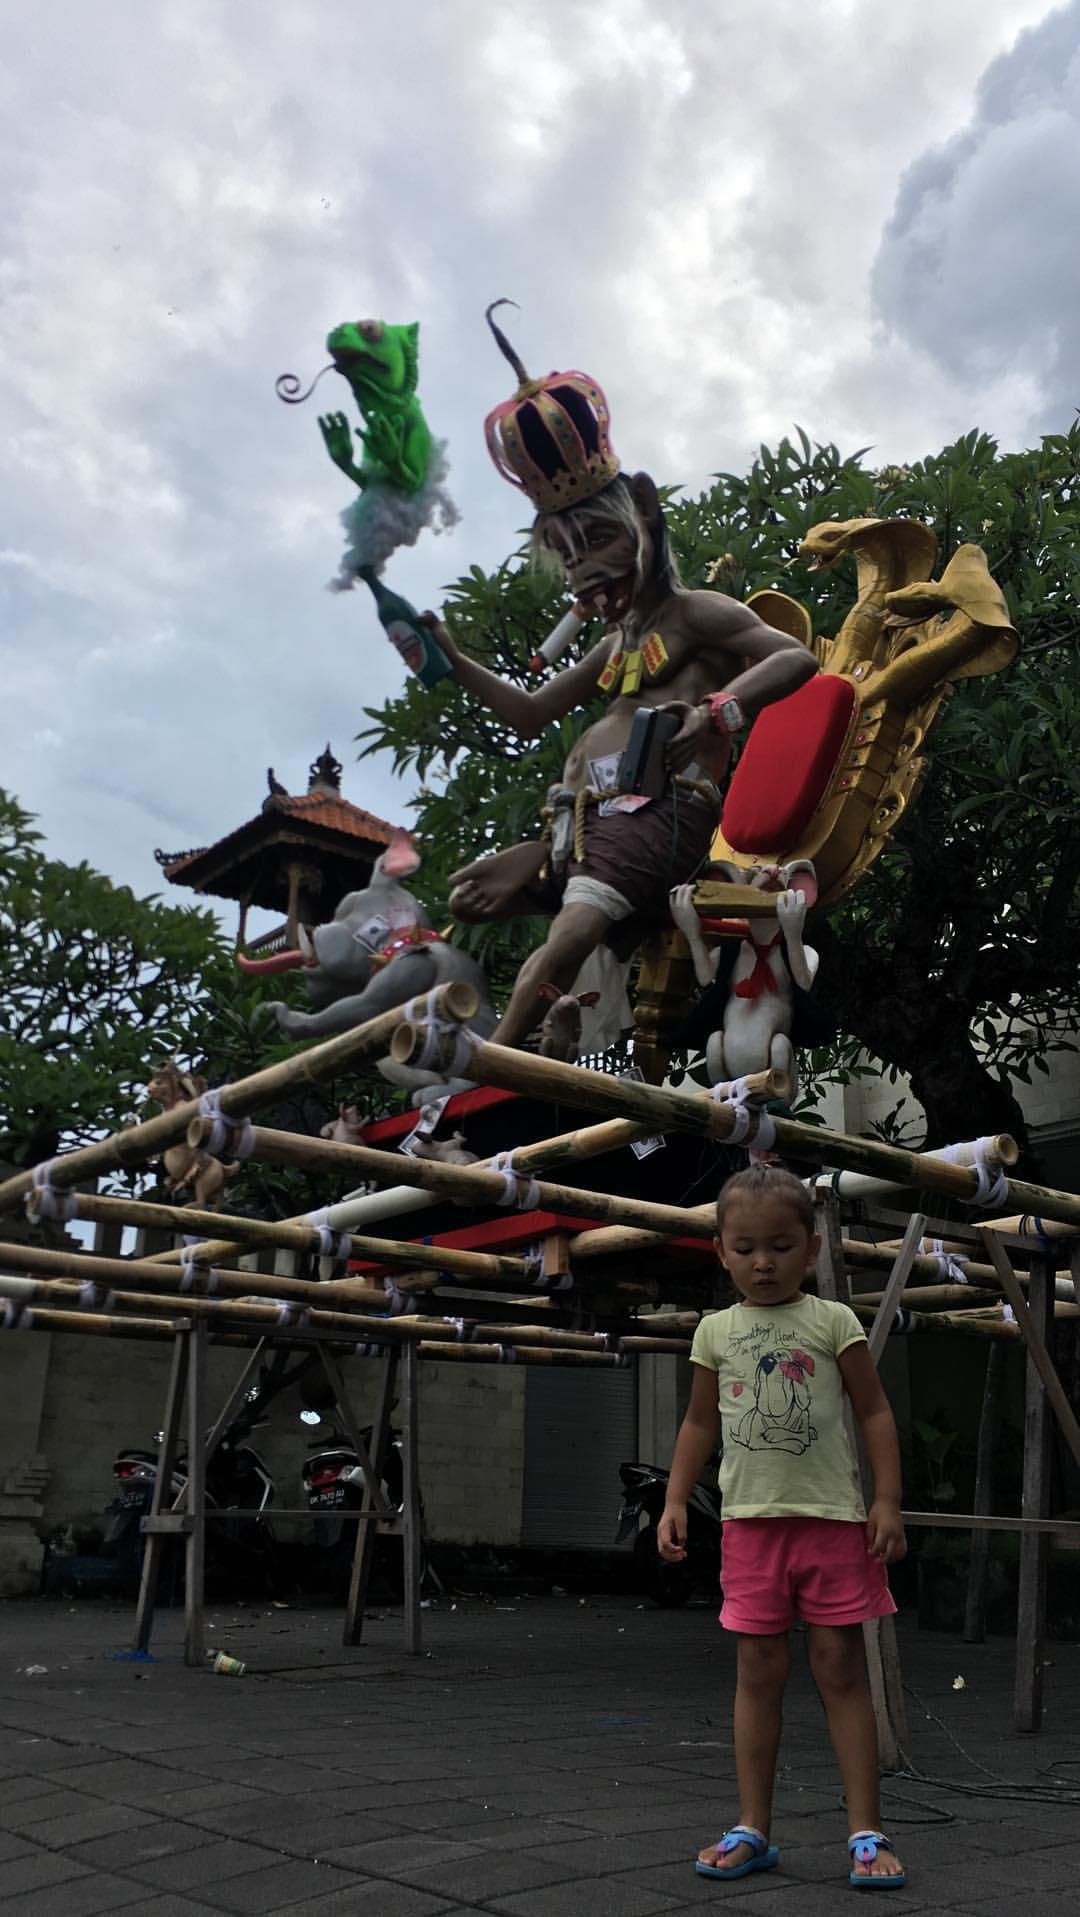 Silent day Bali, dan tišine na Baliju